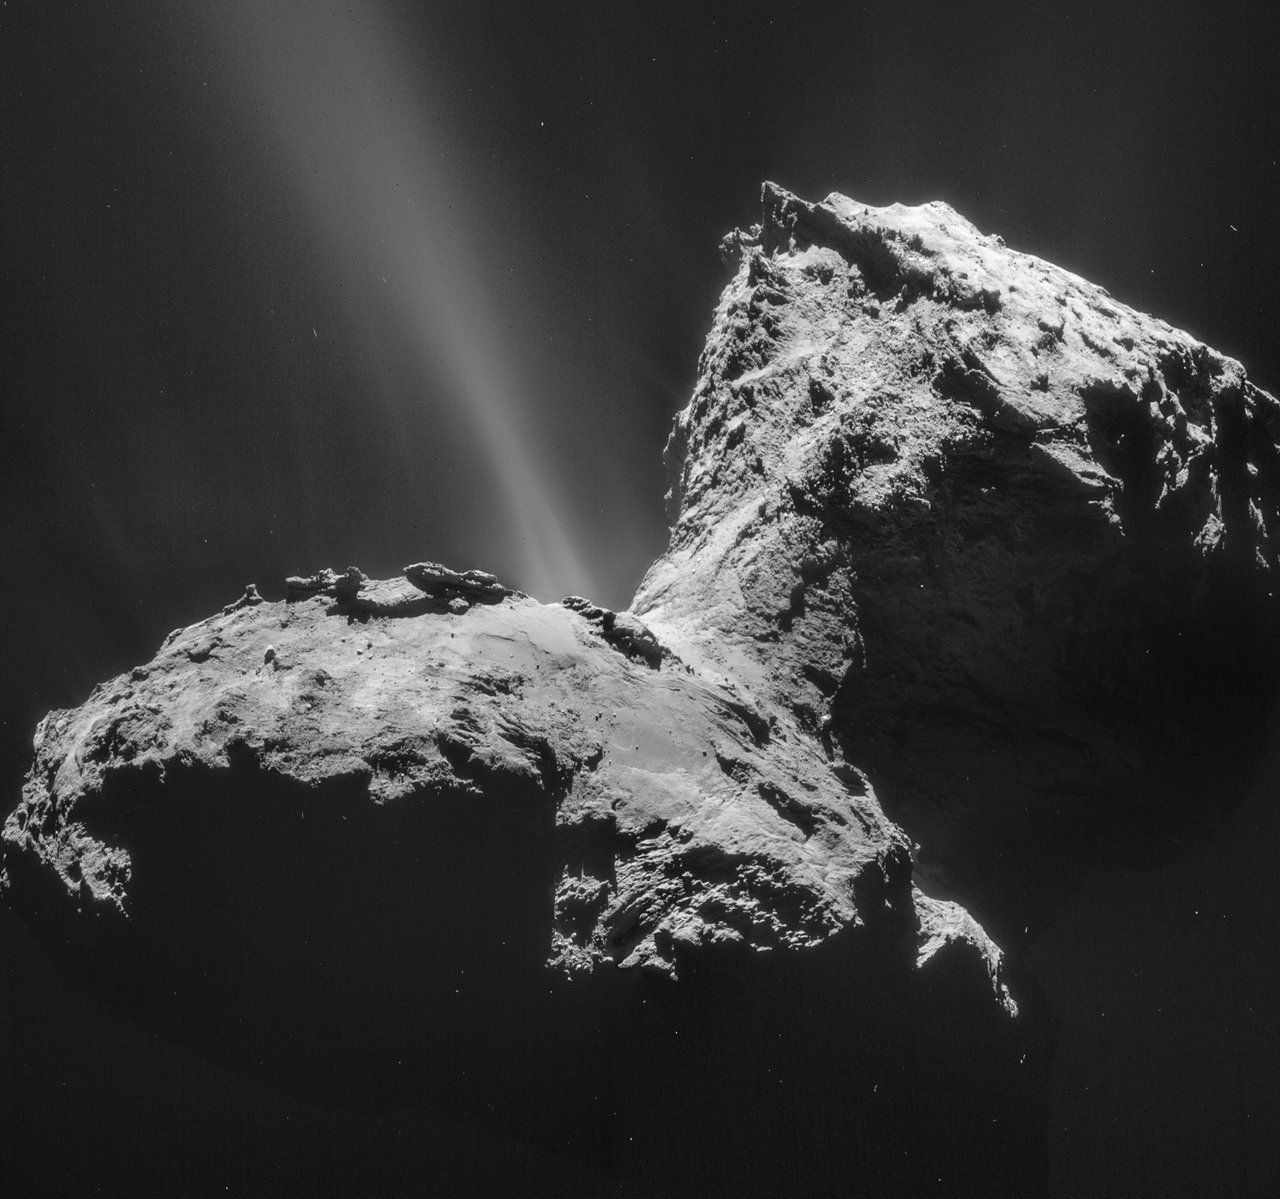 1297_ESA_Rosetta_NavCam_20150131_Mosaic